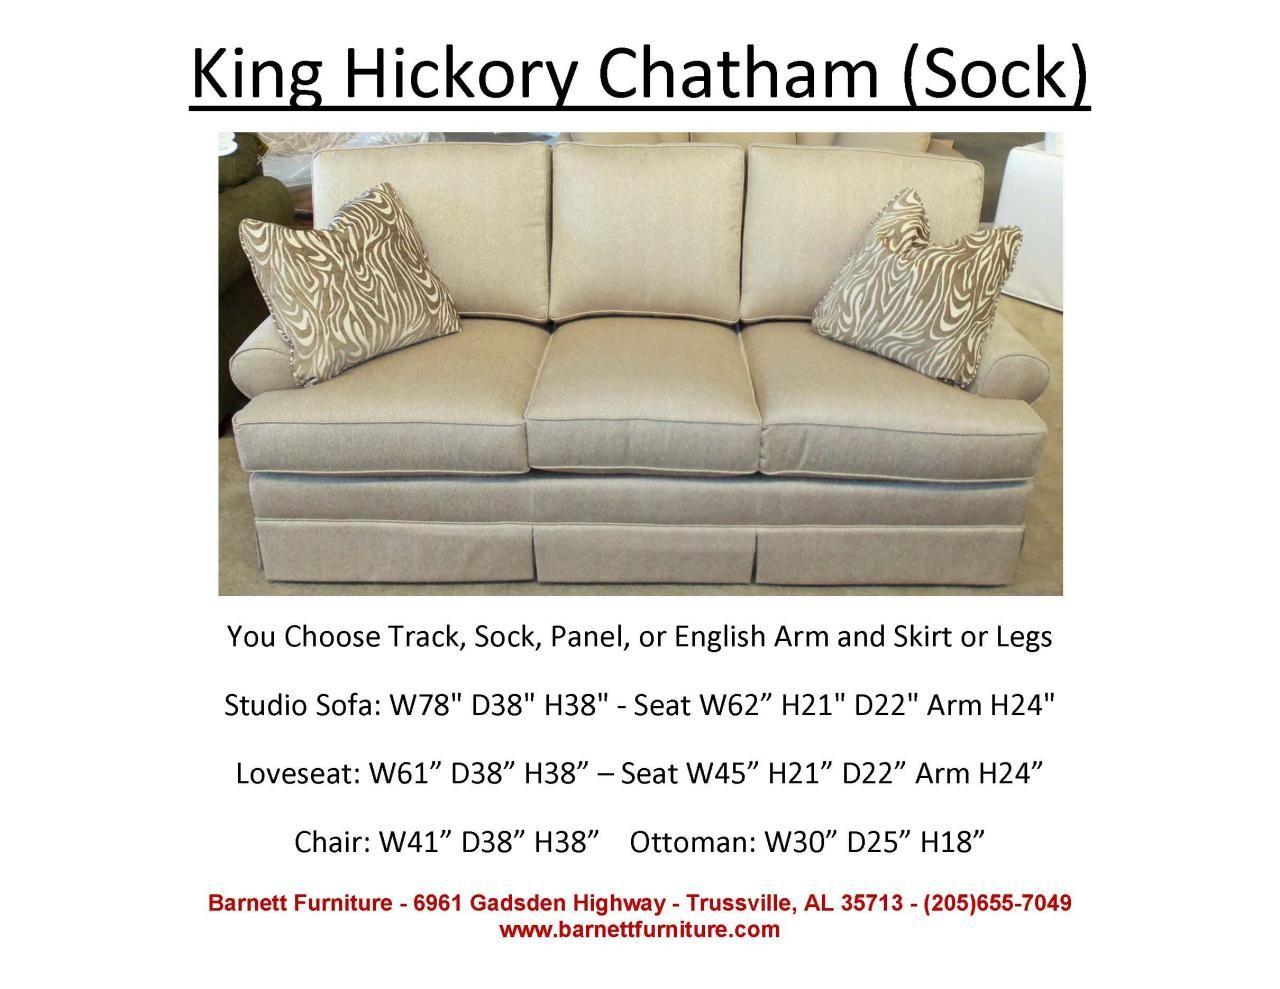 Outstanding King Hickory Chatham Sofa Sock Arm Skirt Apartment Size Inzonedesignstudio Interior Chair Design Inzonedesignstudiocom